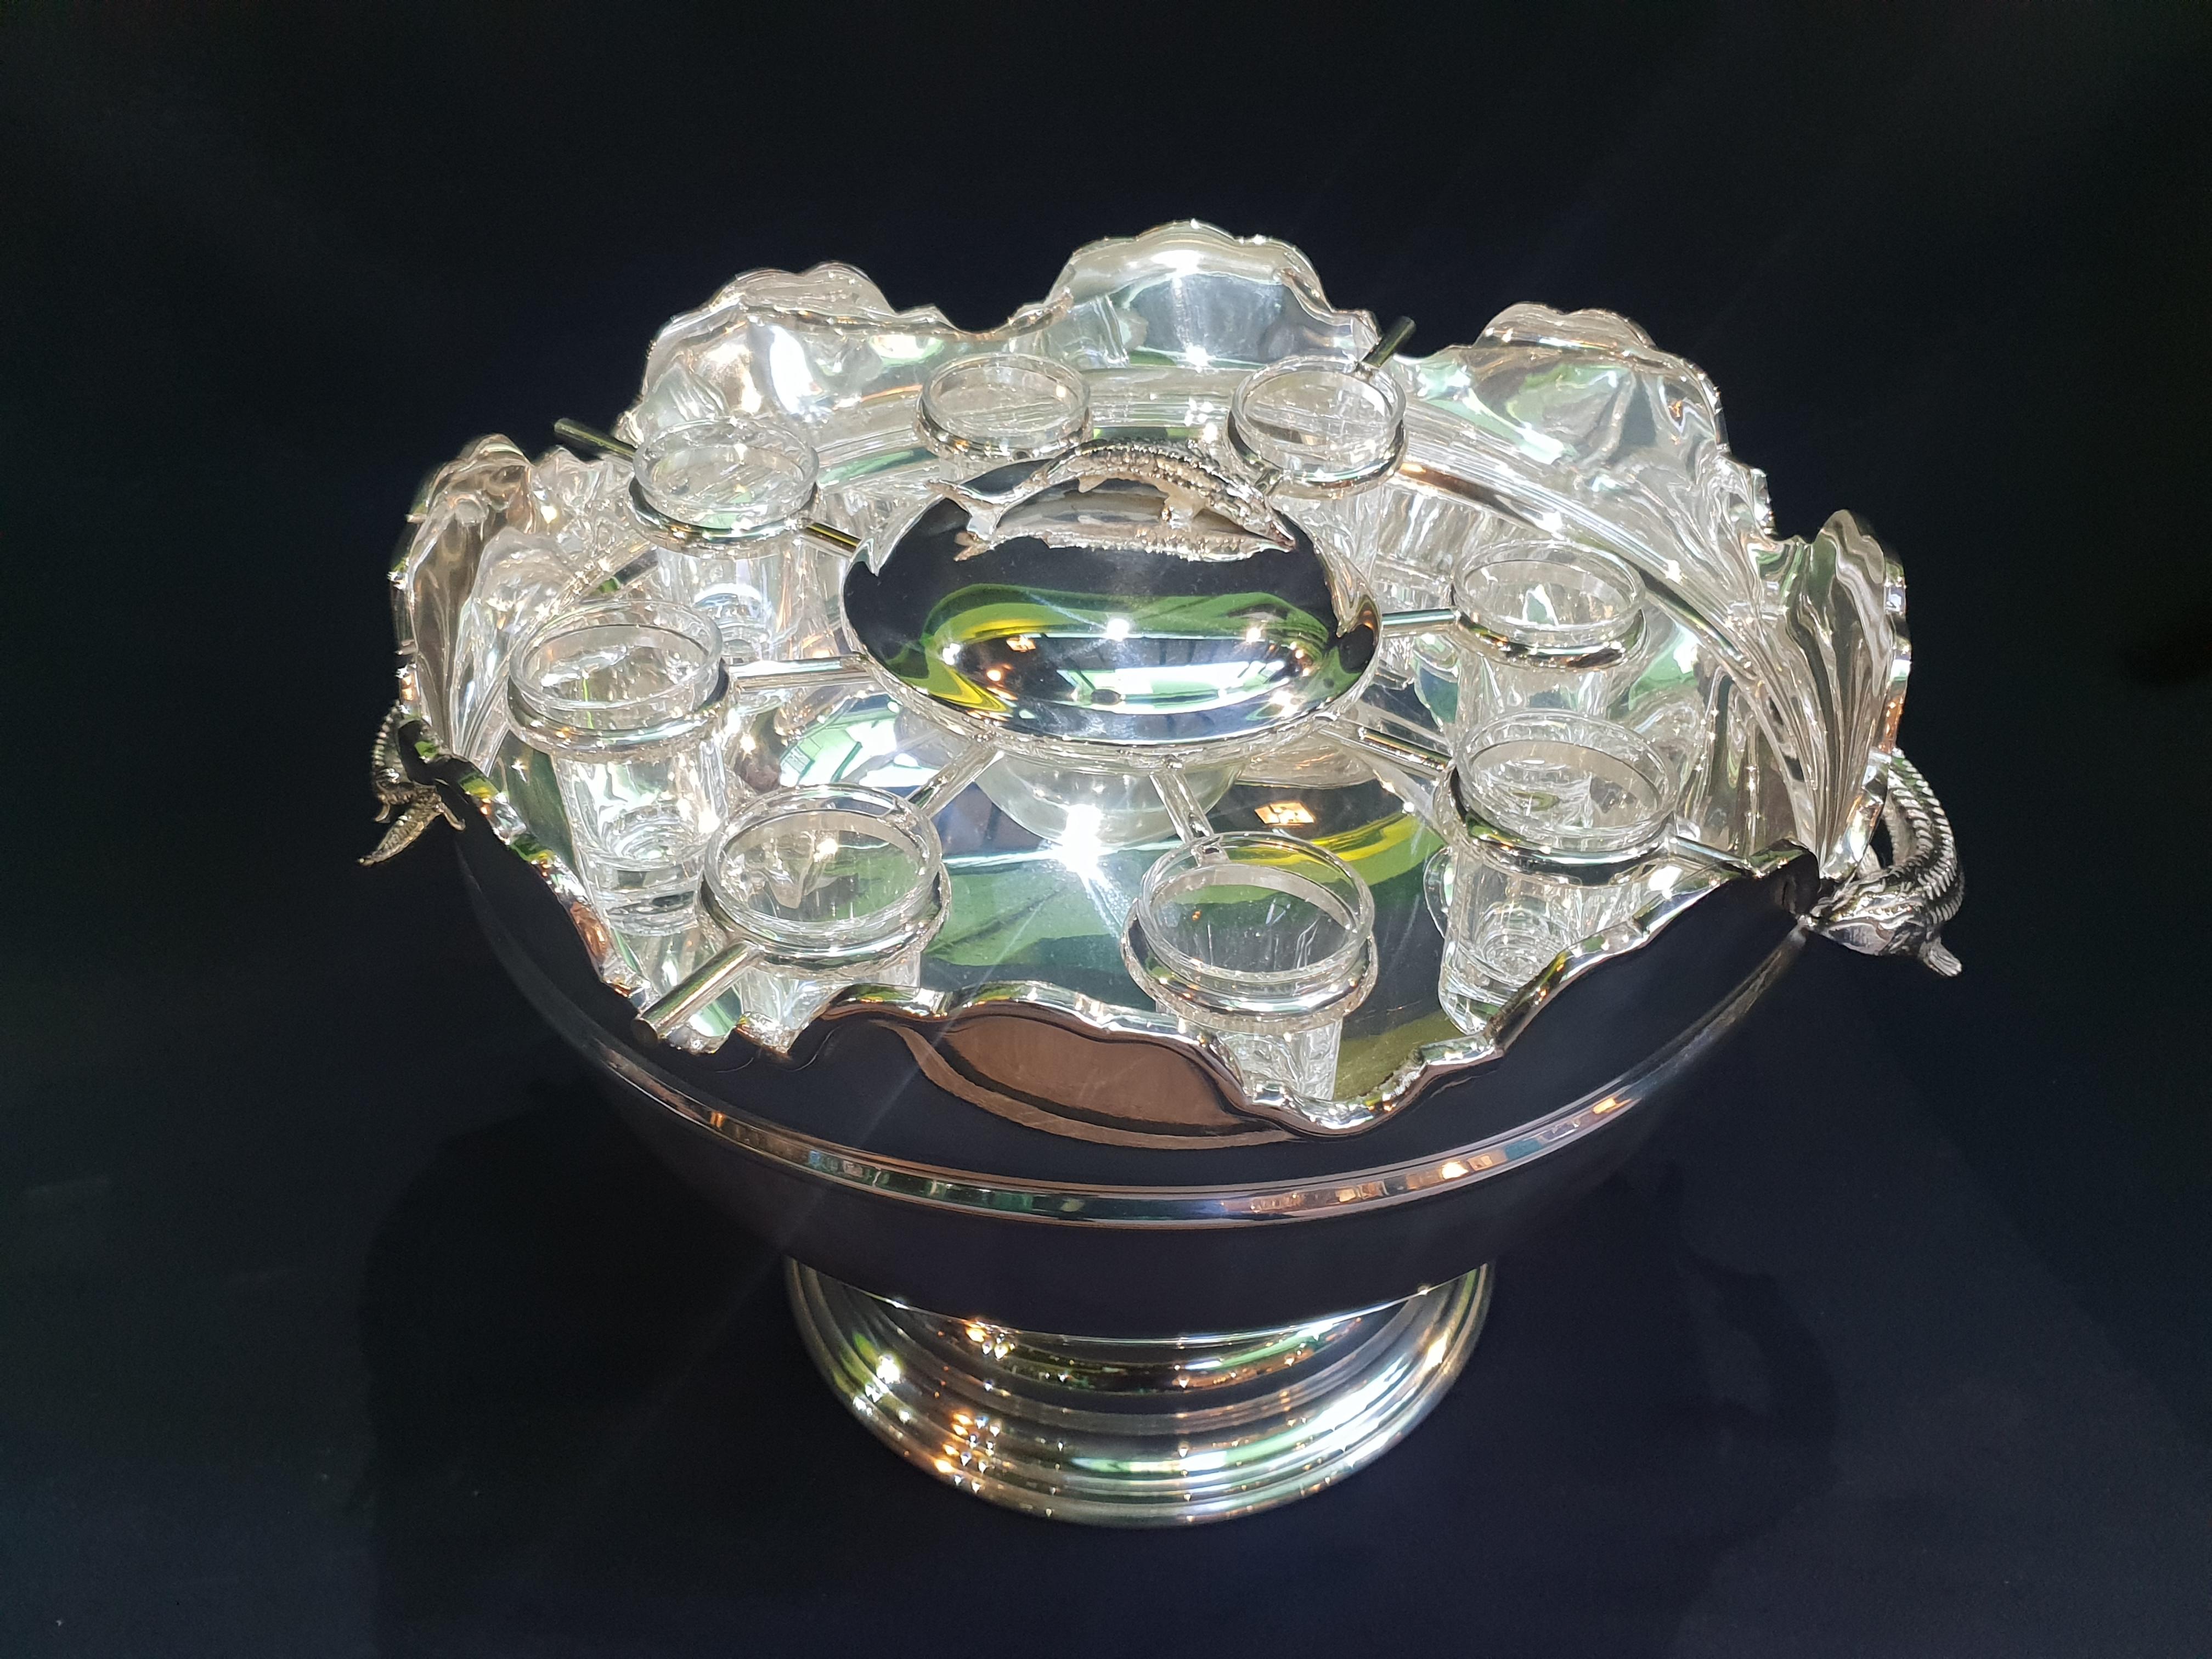 C20th Russian Silver Plated Caviar Bowl